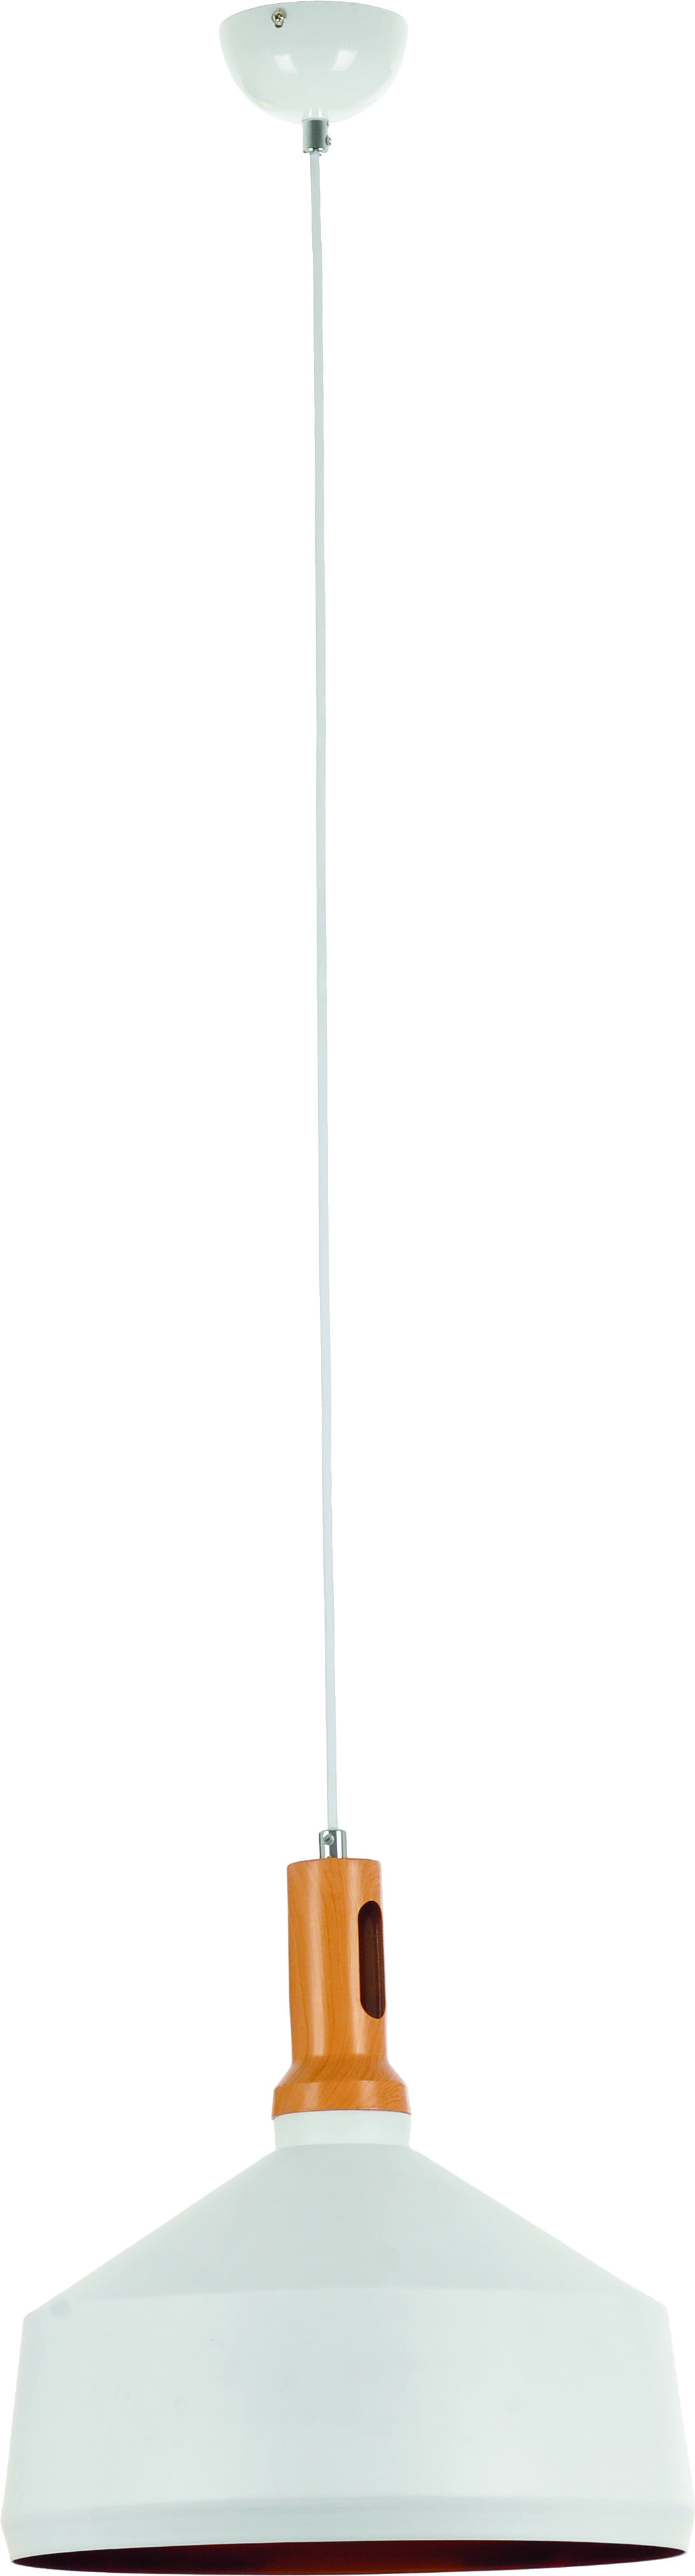 Pendant lamp Selene in the Scandinavian style 60W